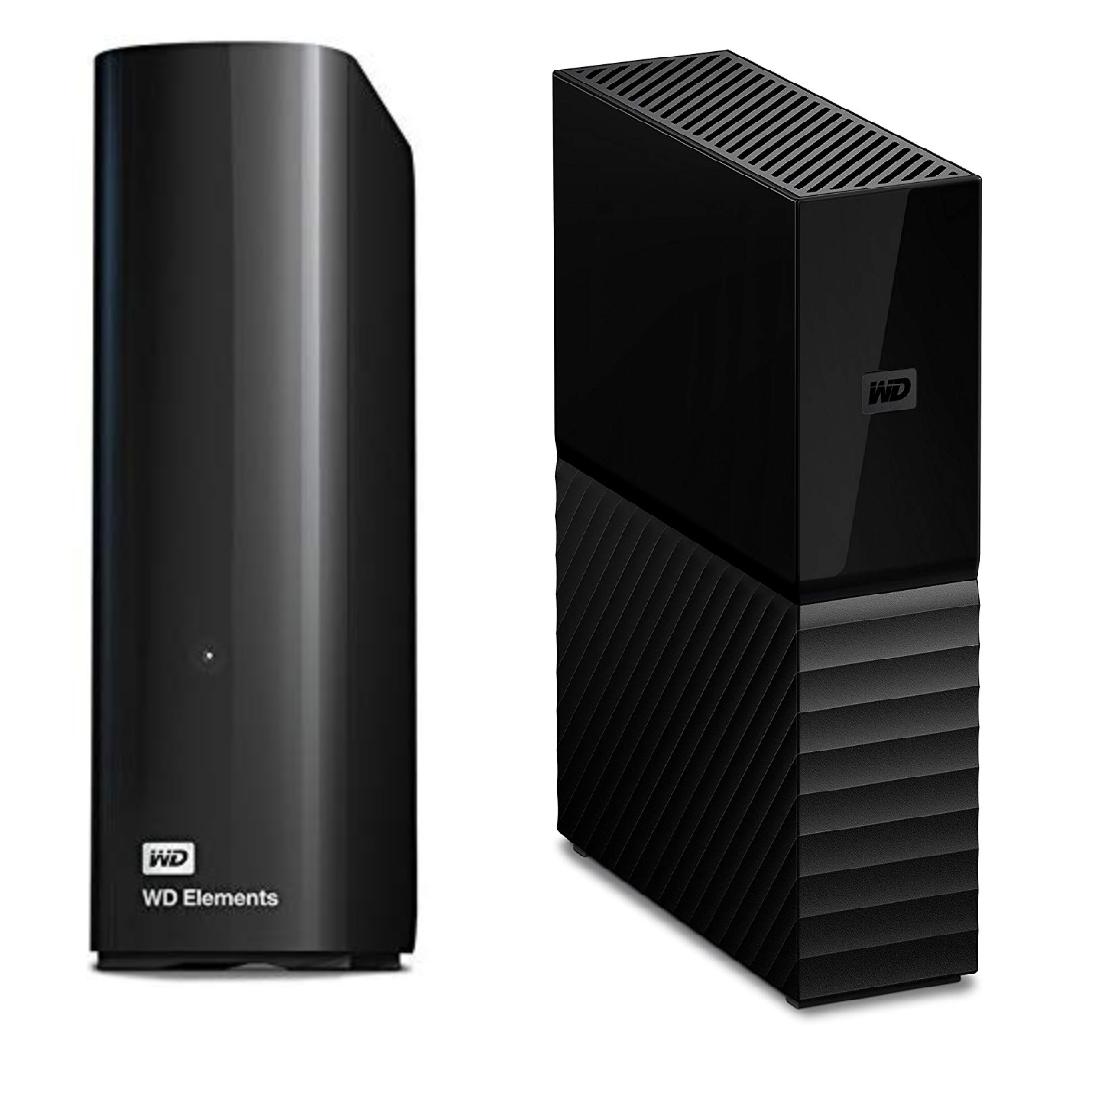 WD 6 TB My Book Desktop Hard Drive - Black for £85.99/WD 8TB Elements Desktop External Hard Drive - USB 3.0 for £114.99 Delivered @ Amazon